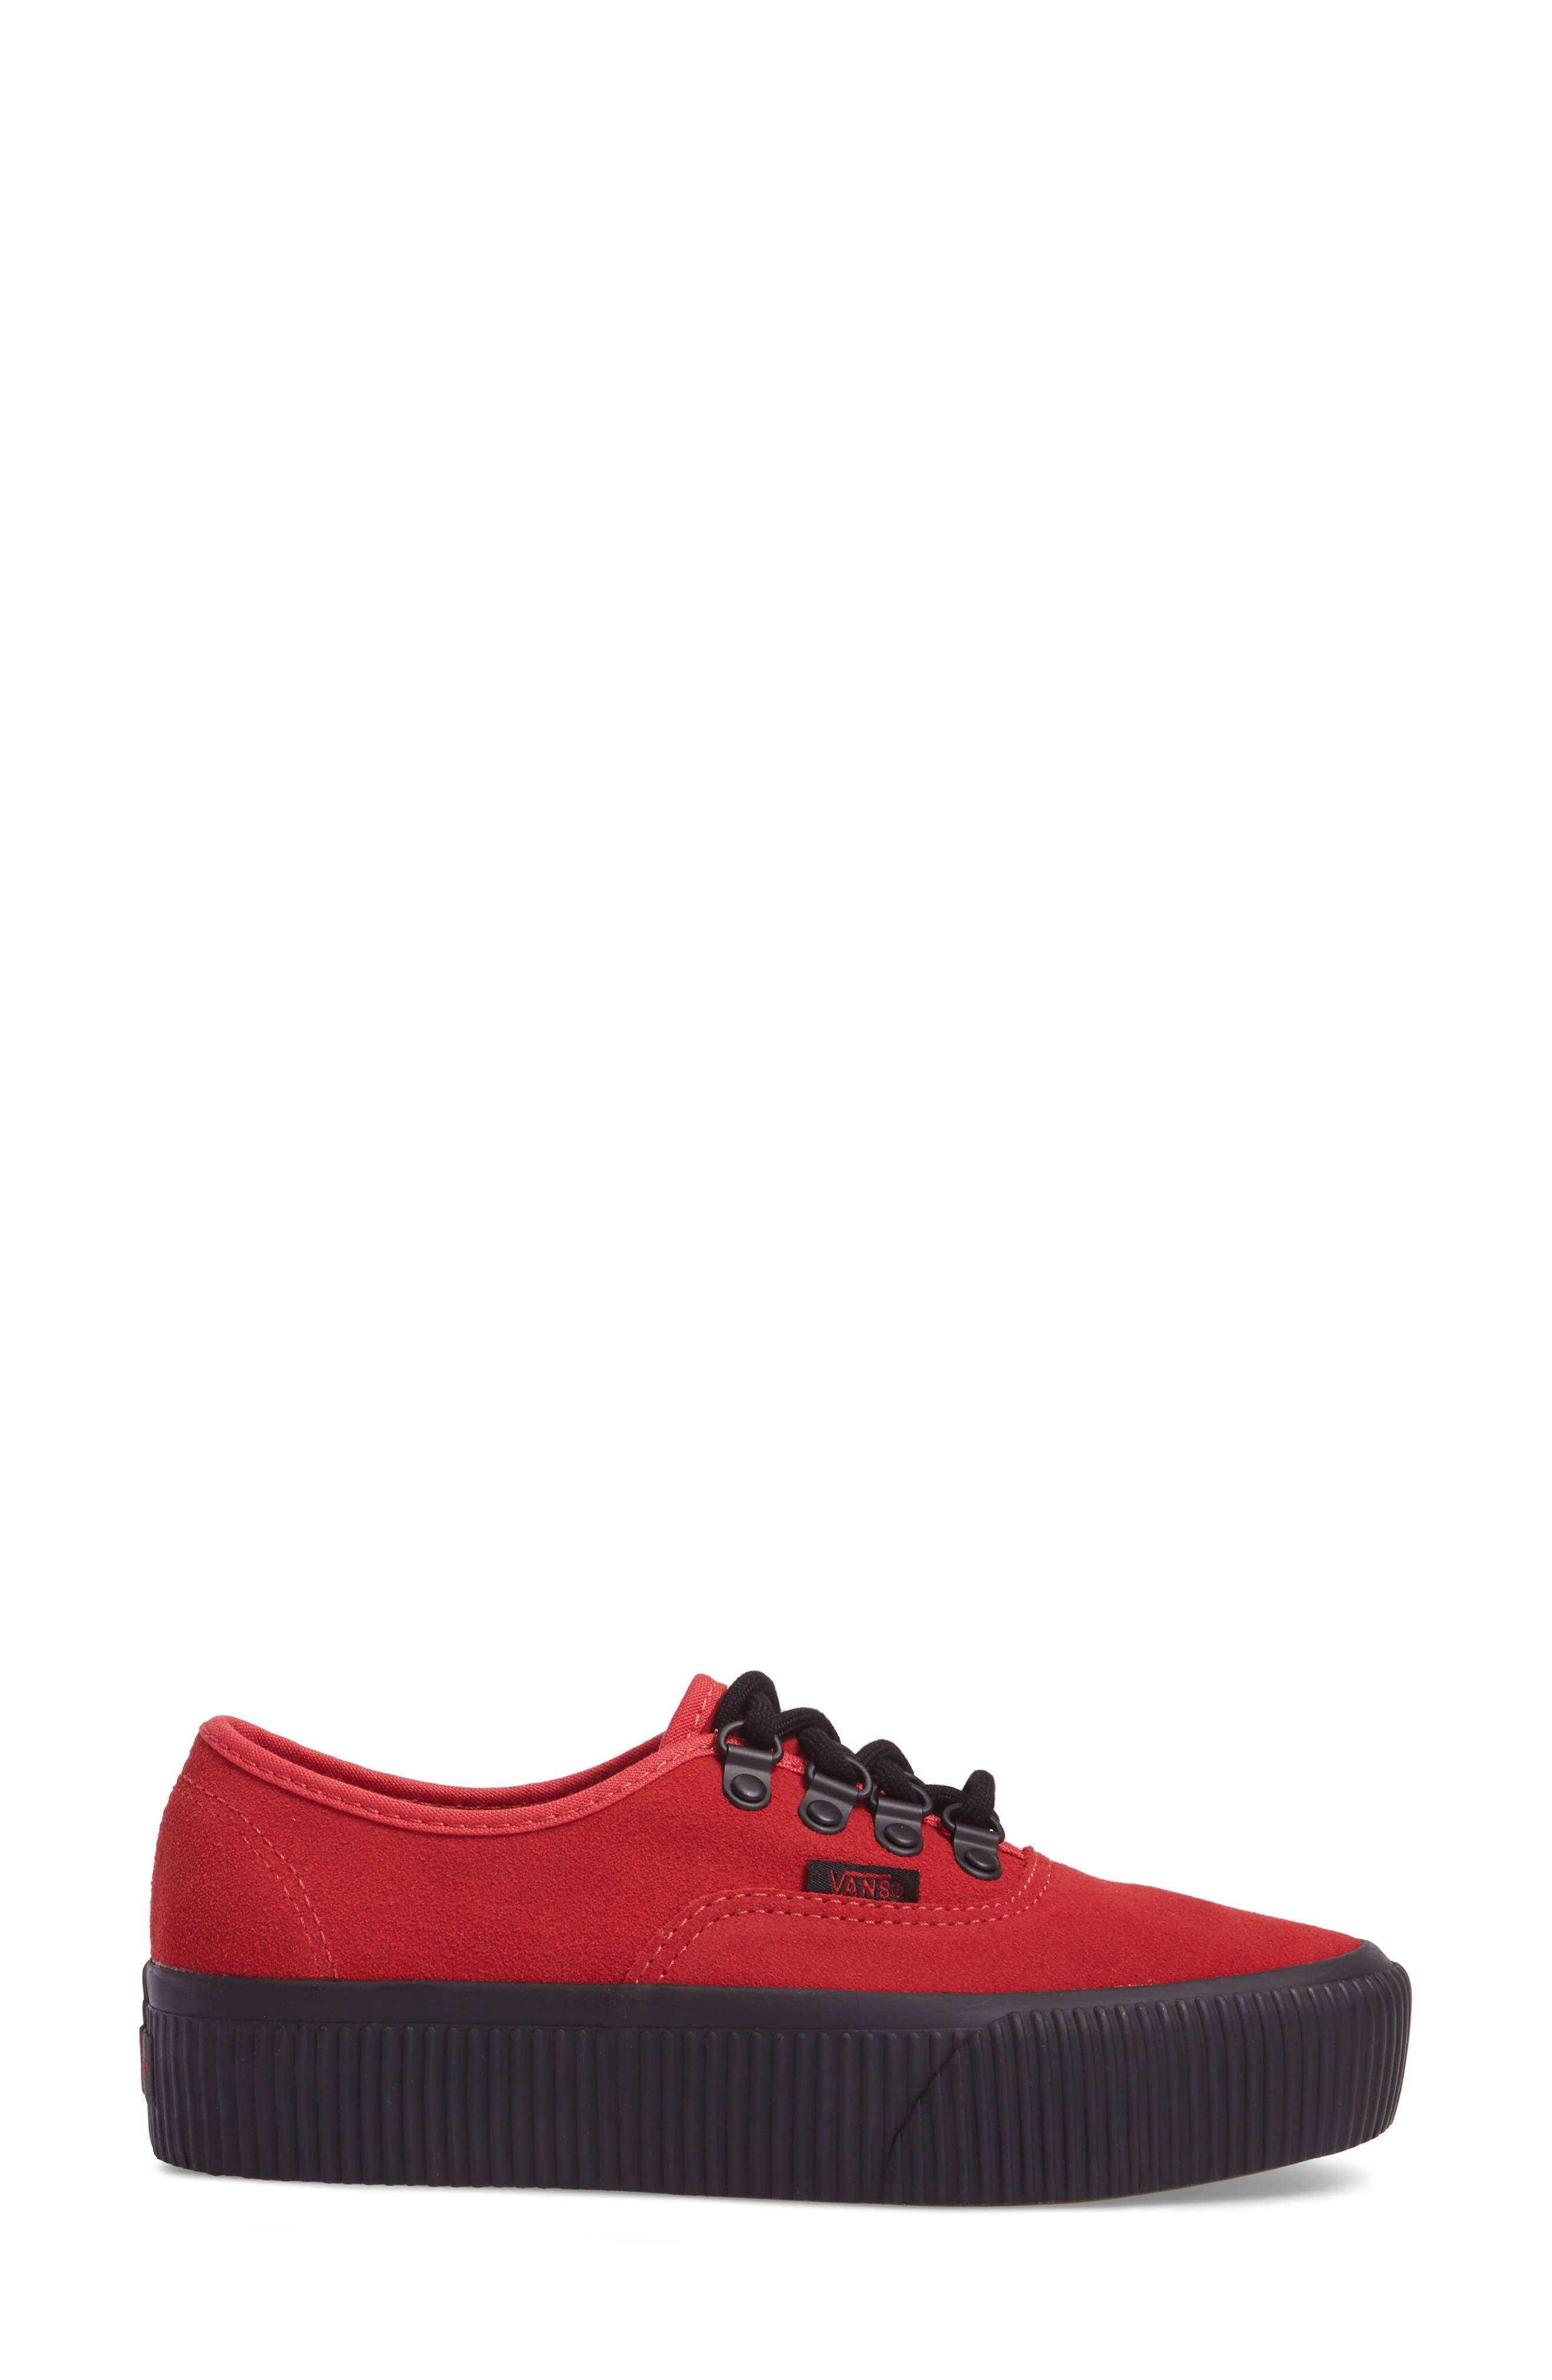 Alternate Image 3  - Vans Authentic 2.0 Platform Sneaker (Women)